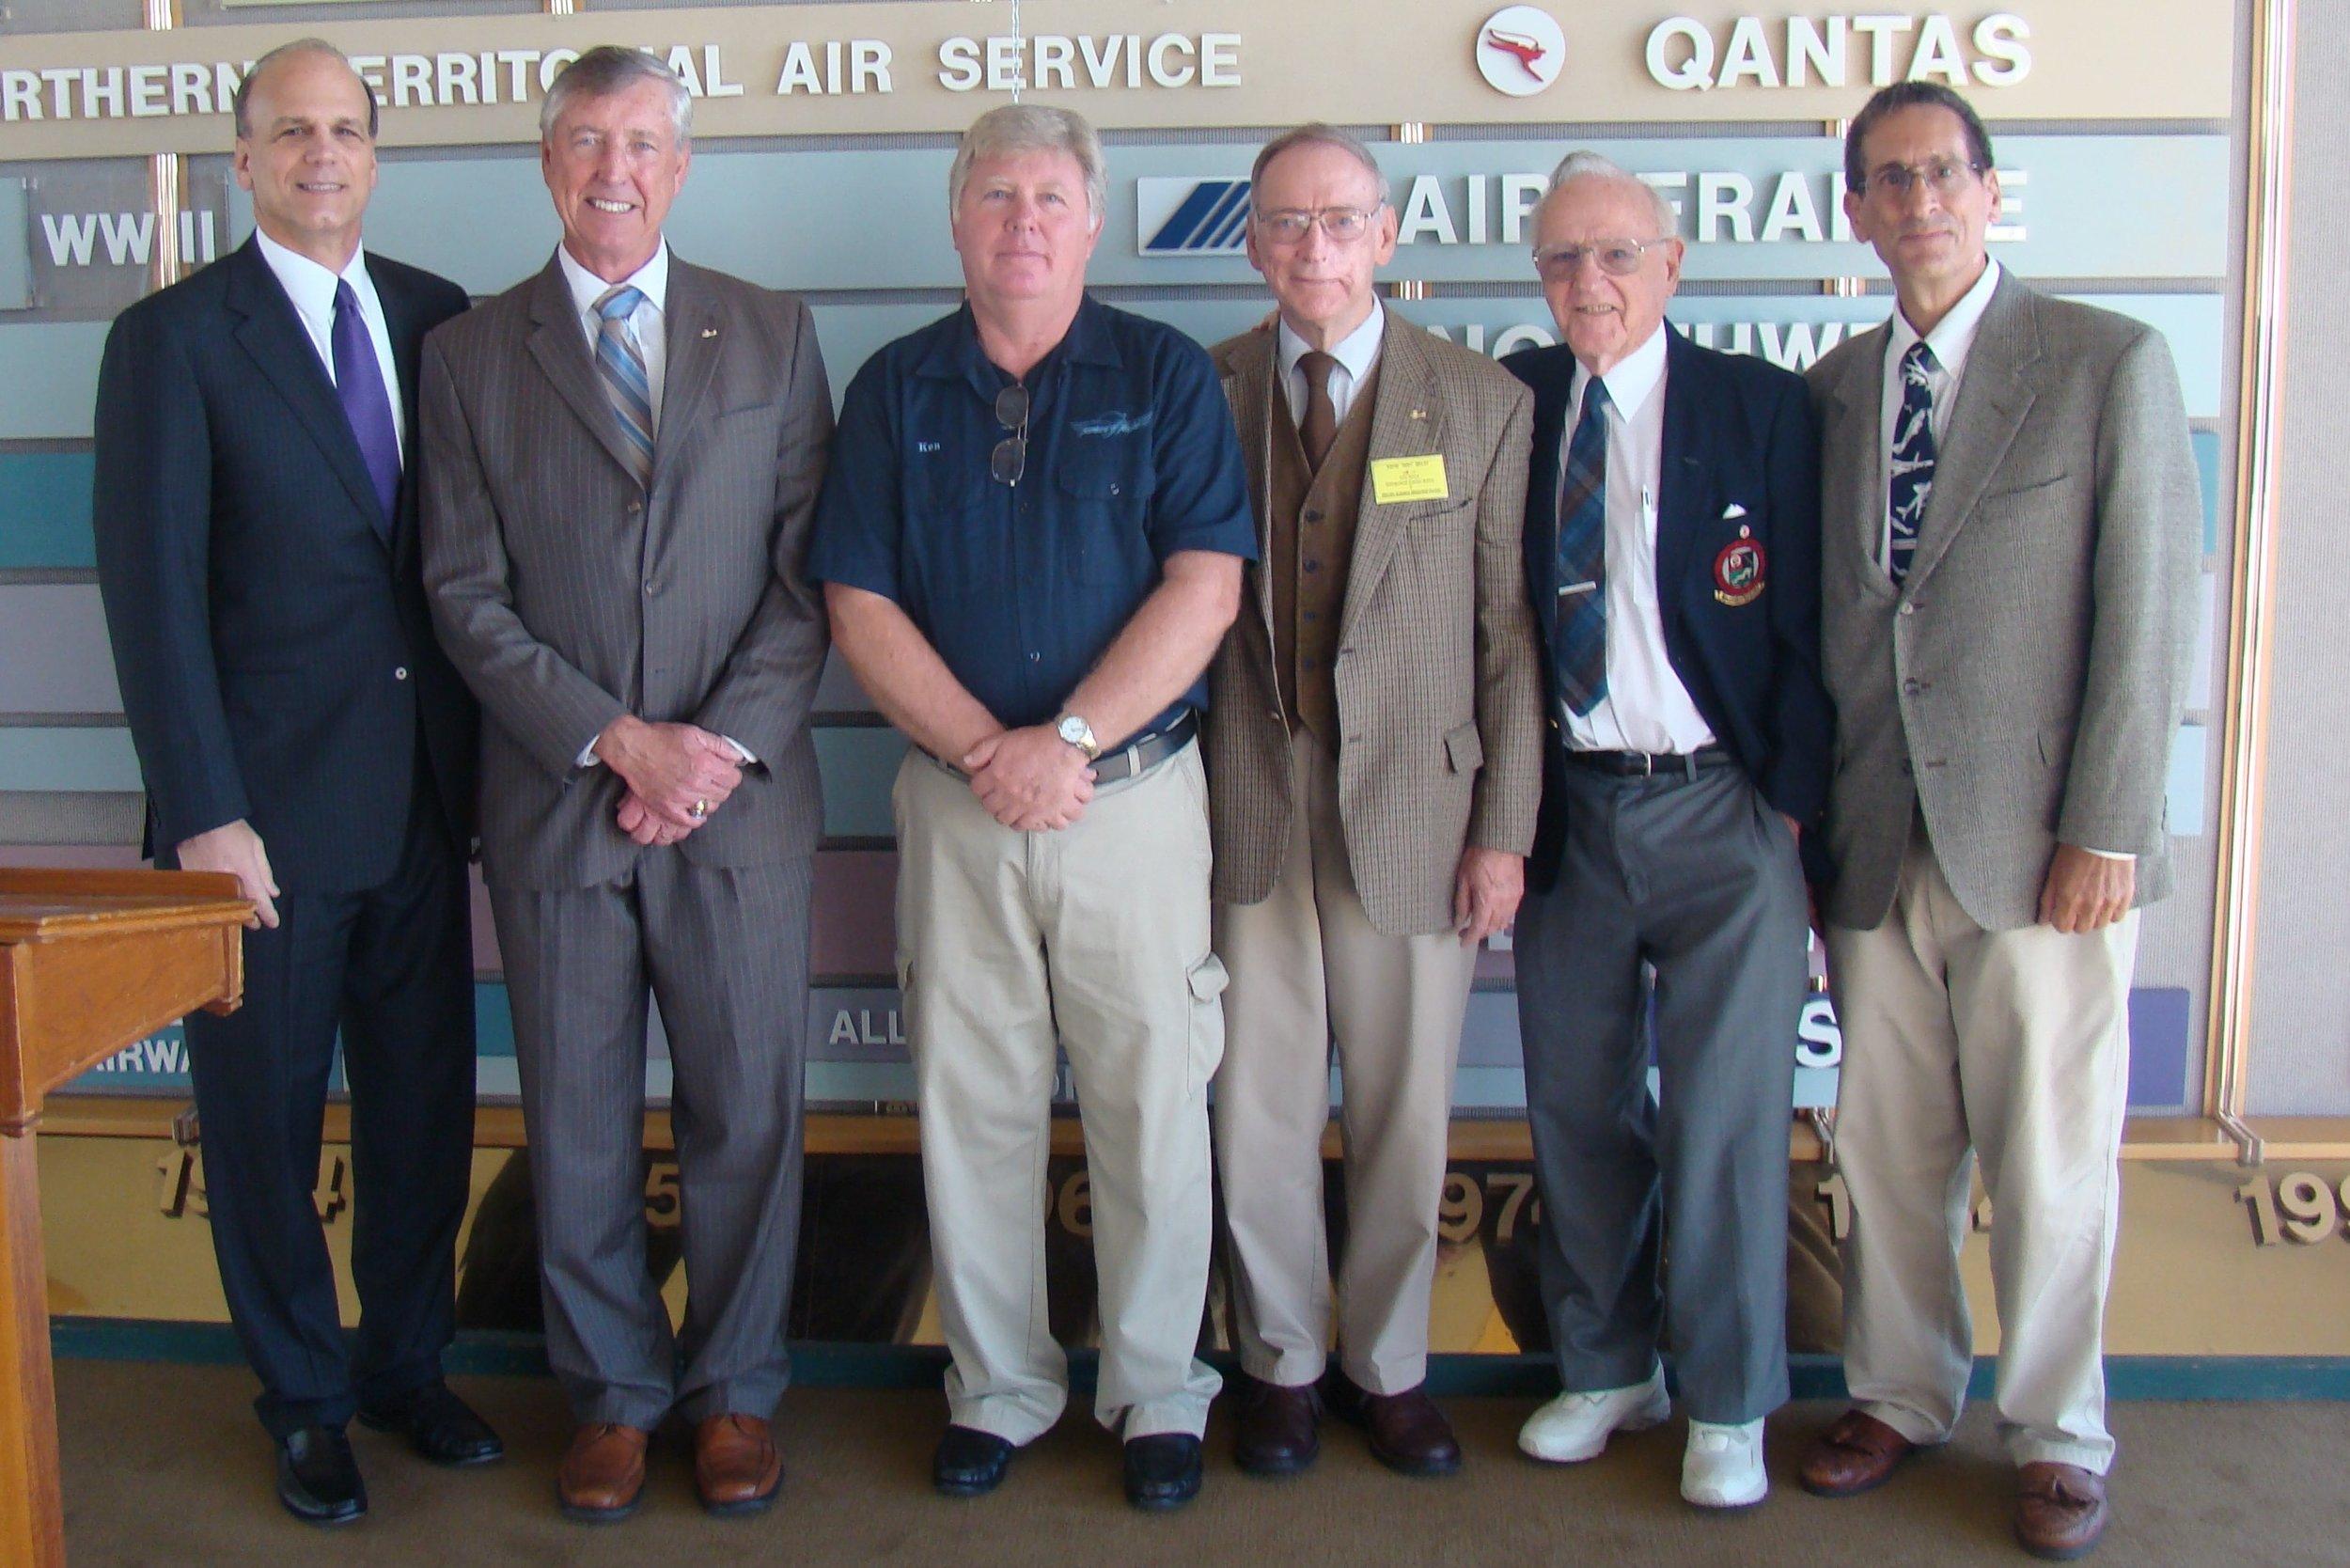 Gary Spulak, Will Michaels, Ken Kellet, David McLay, Warren Brown & Chris Fiore - 1, 14 Mar '12.JPG